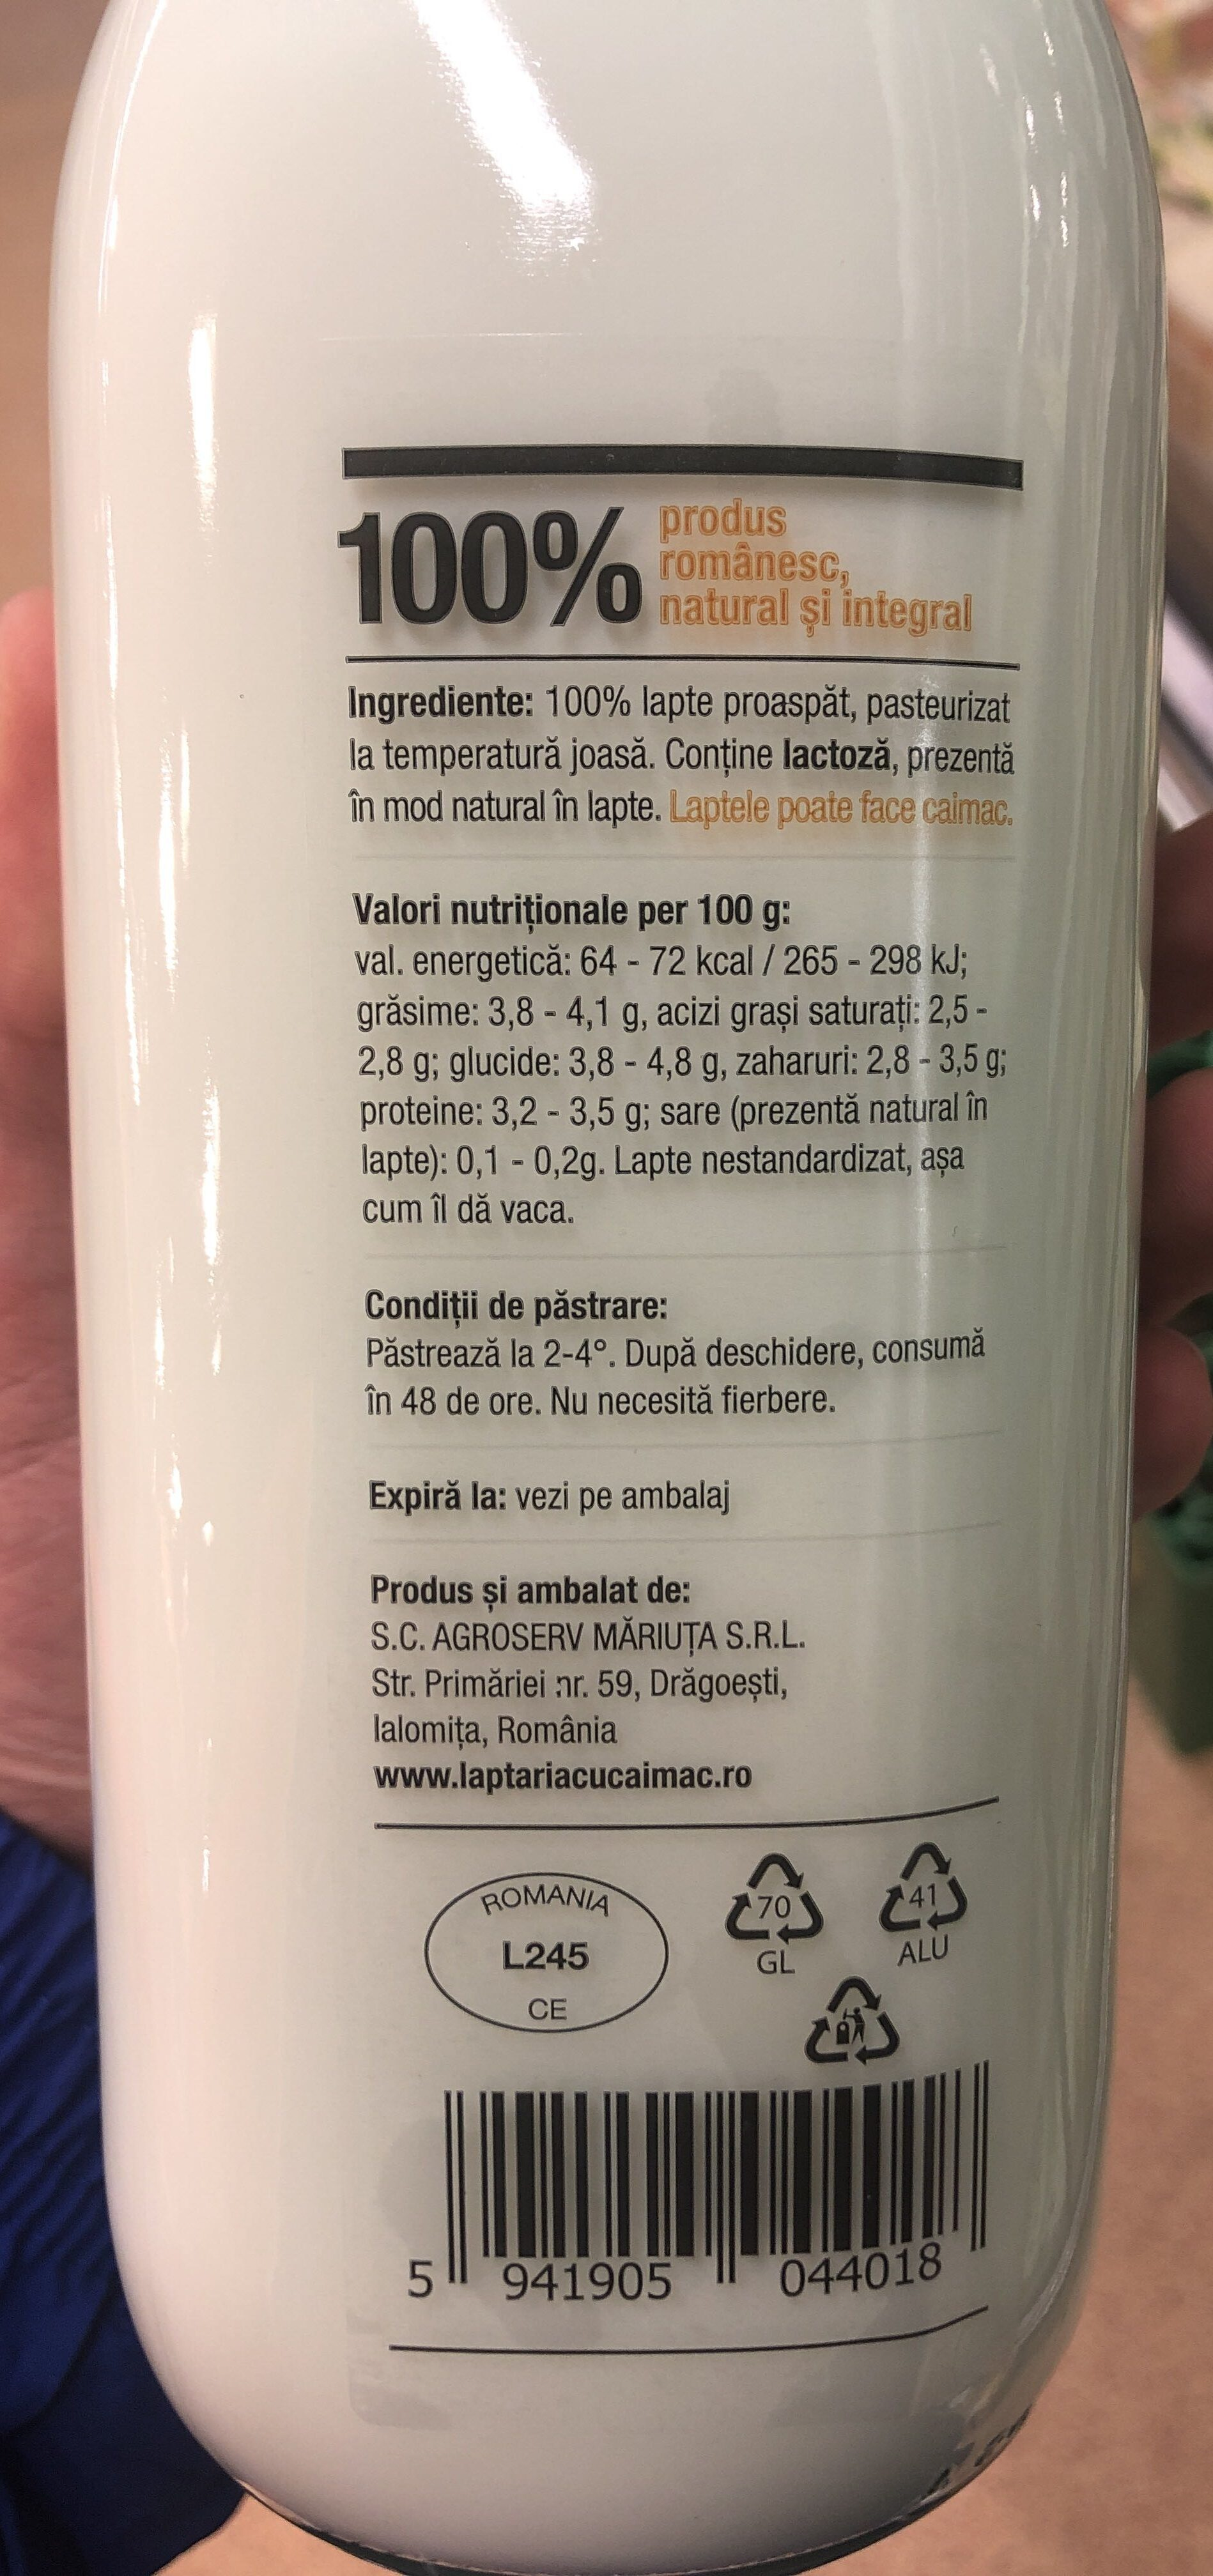 Lapte de vaca - Product - ro